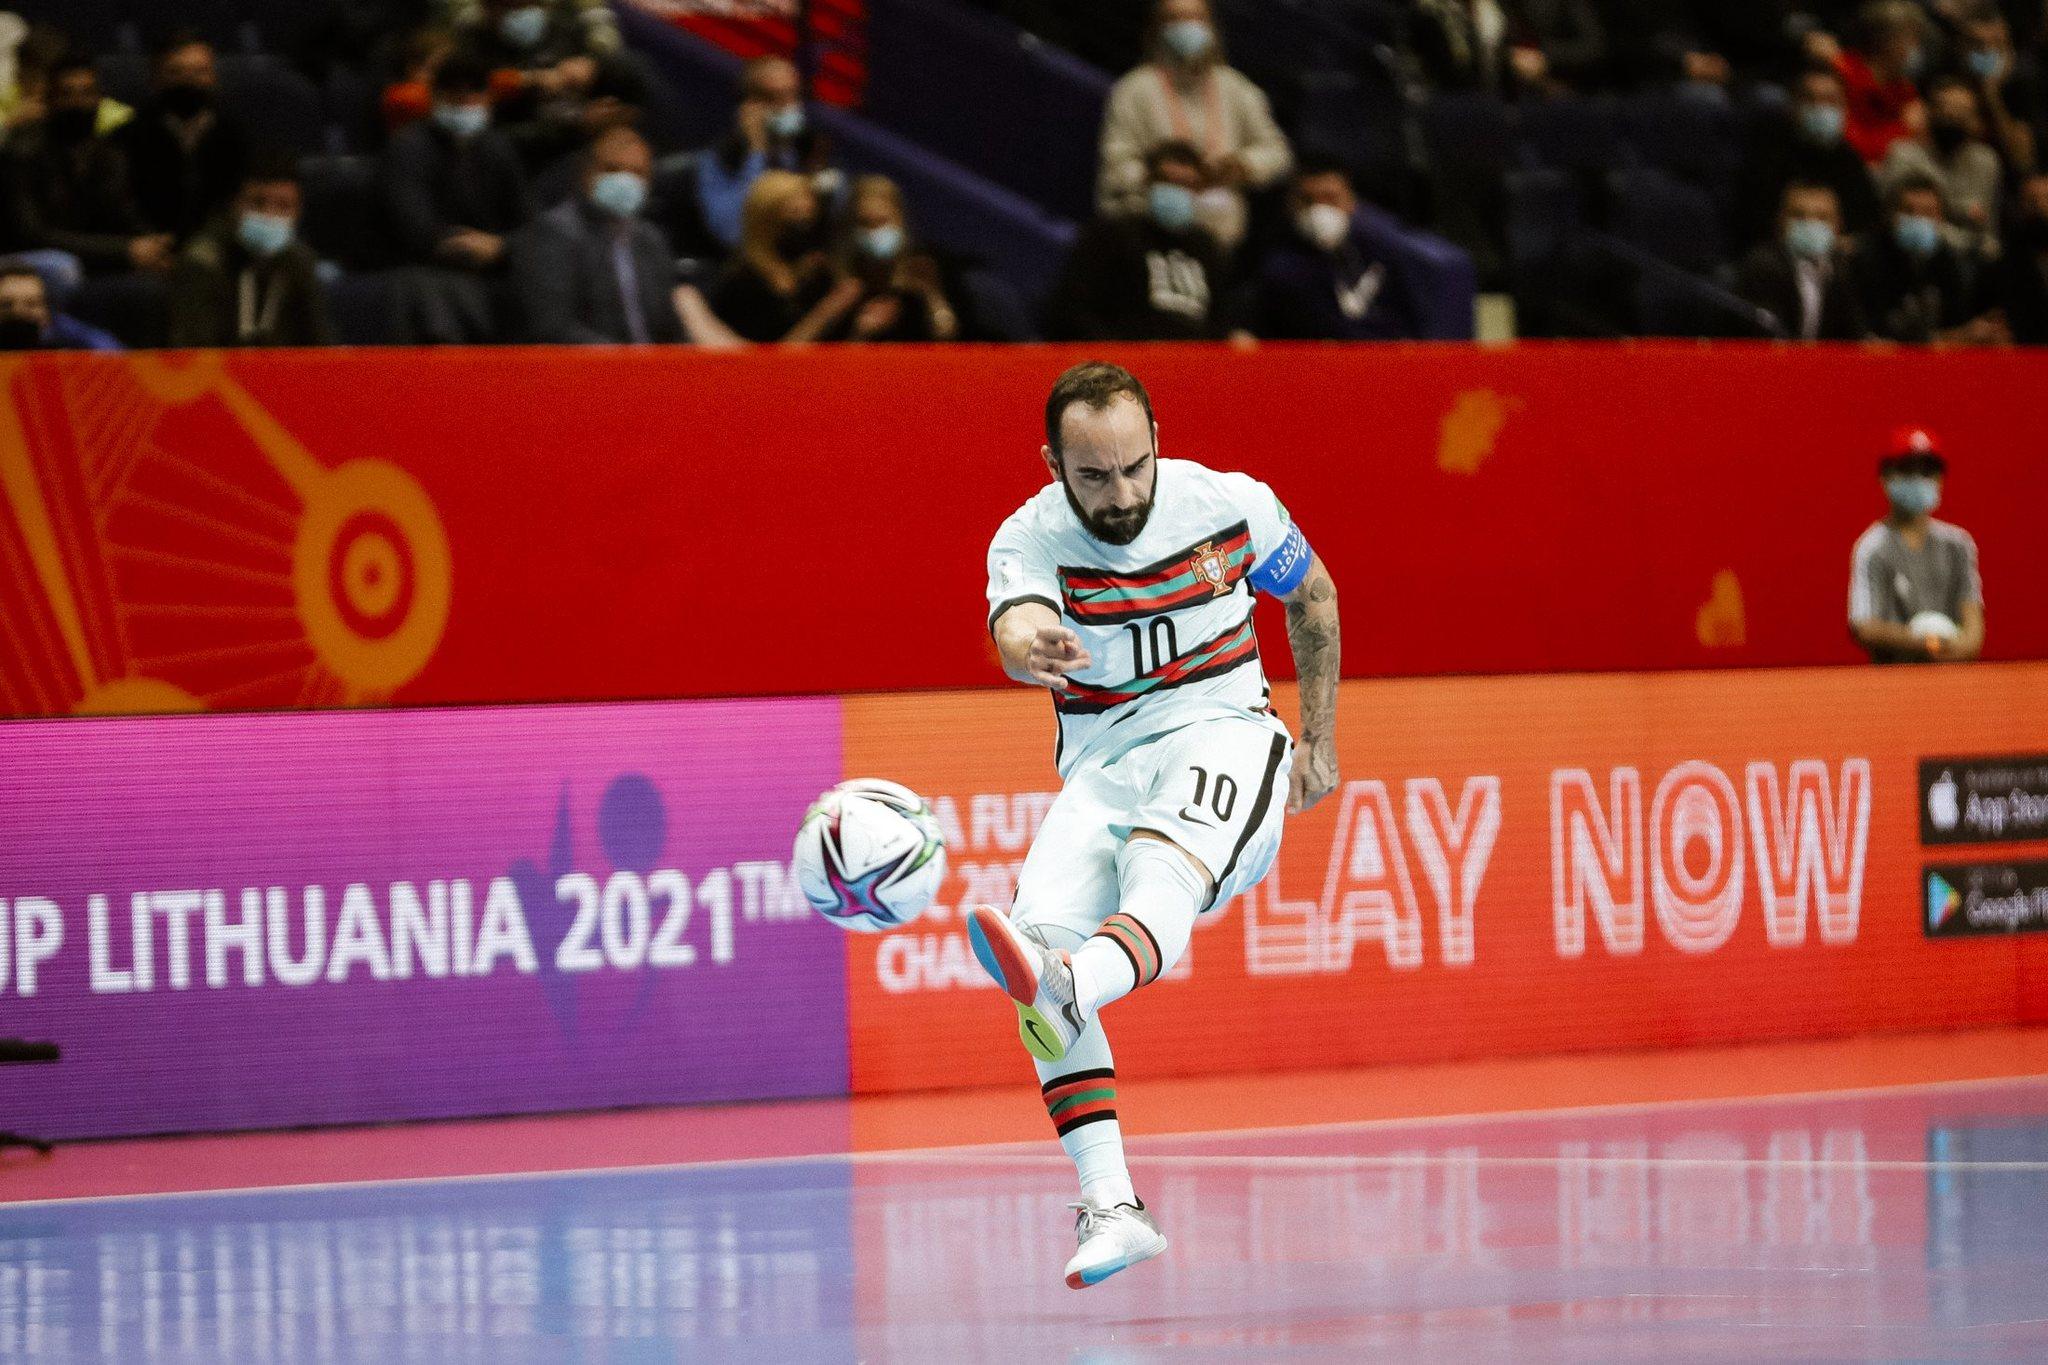 Ricardinho dispara durante el partido contra España